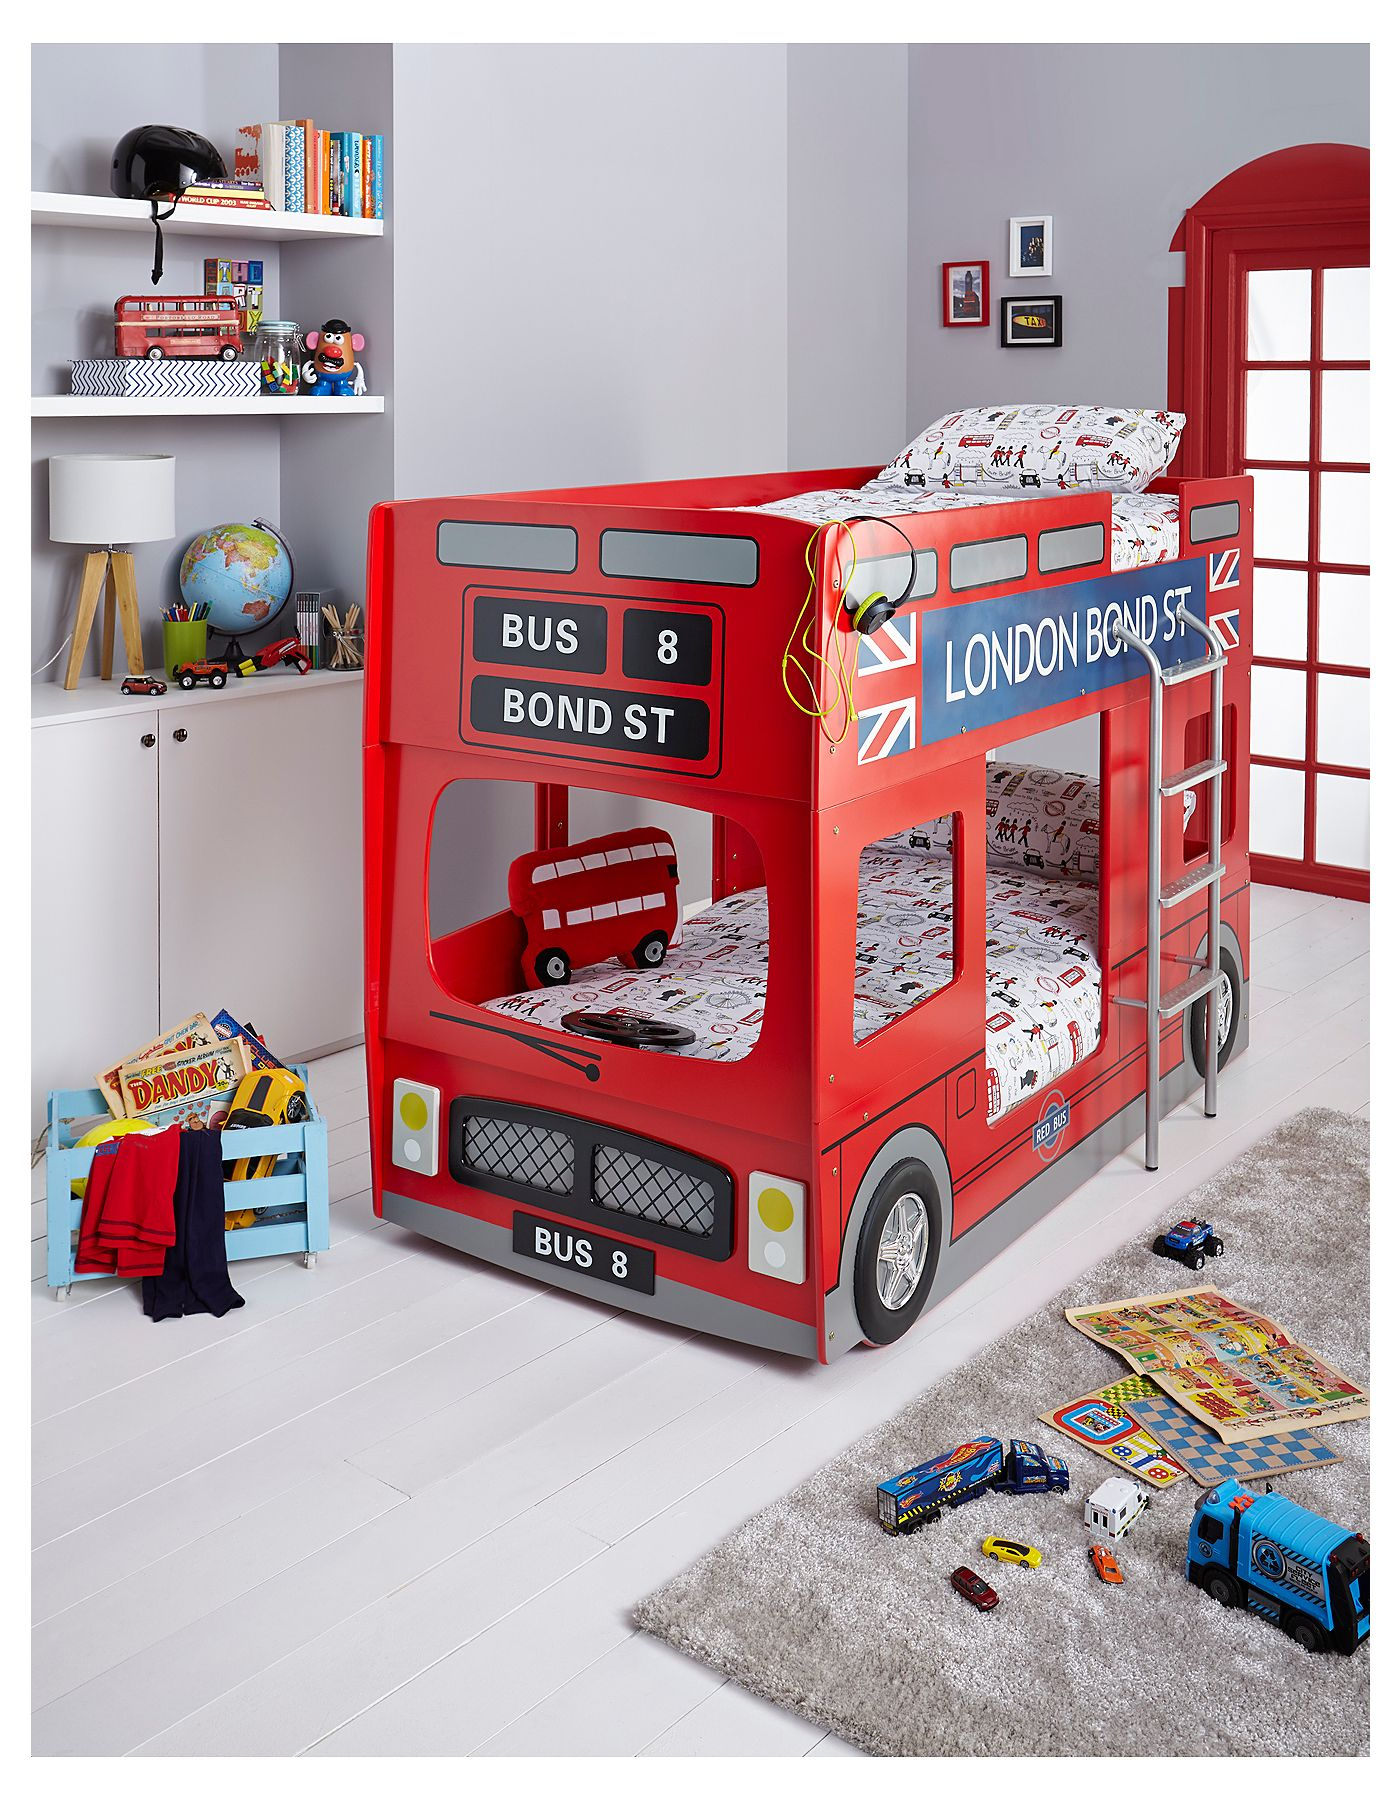 london bus bunk bed furniture asda direct 369 children s room